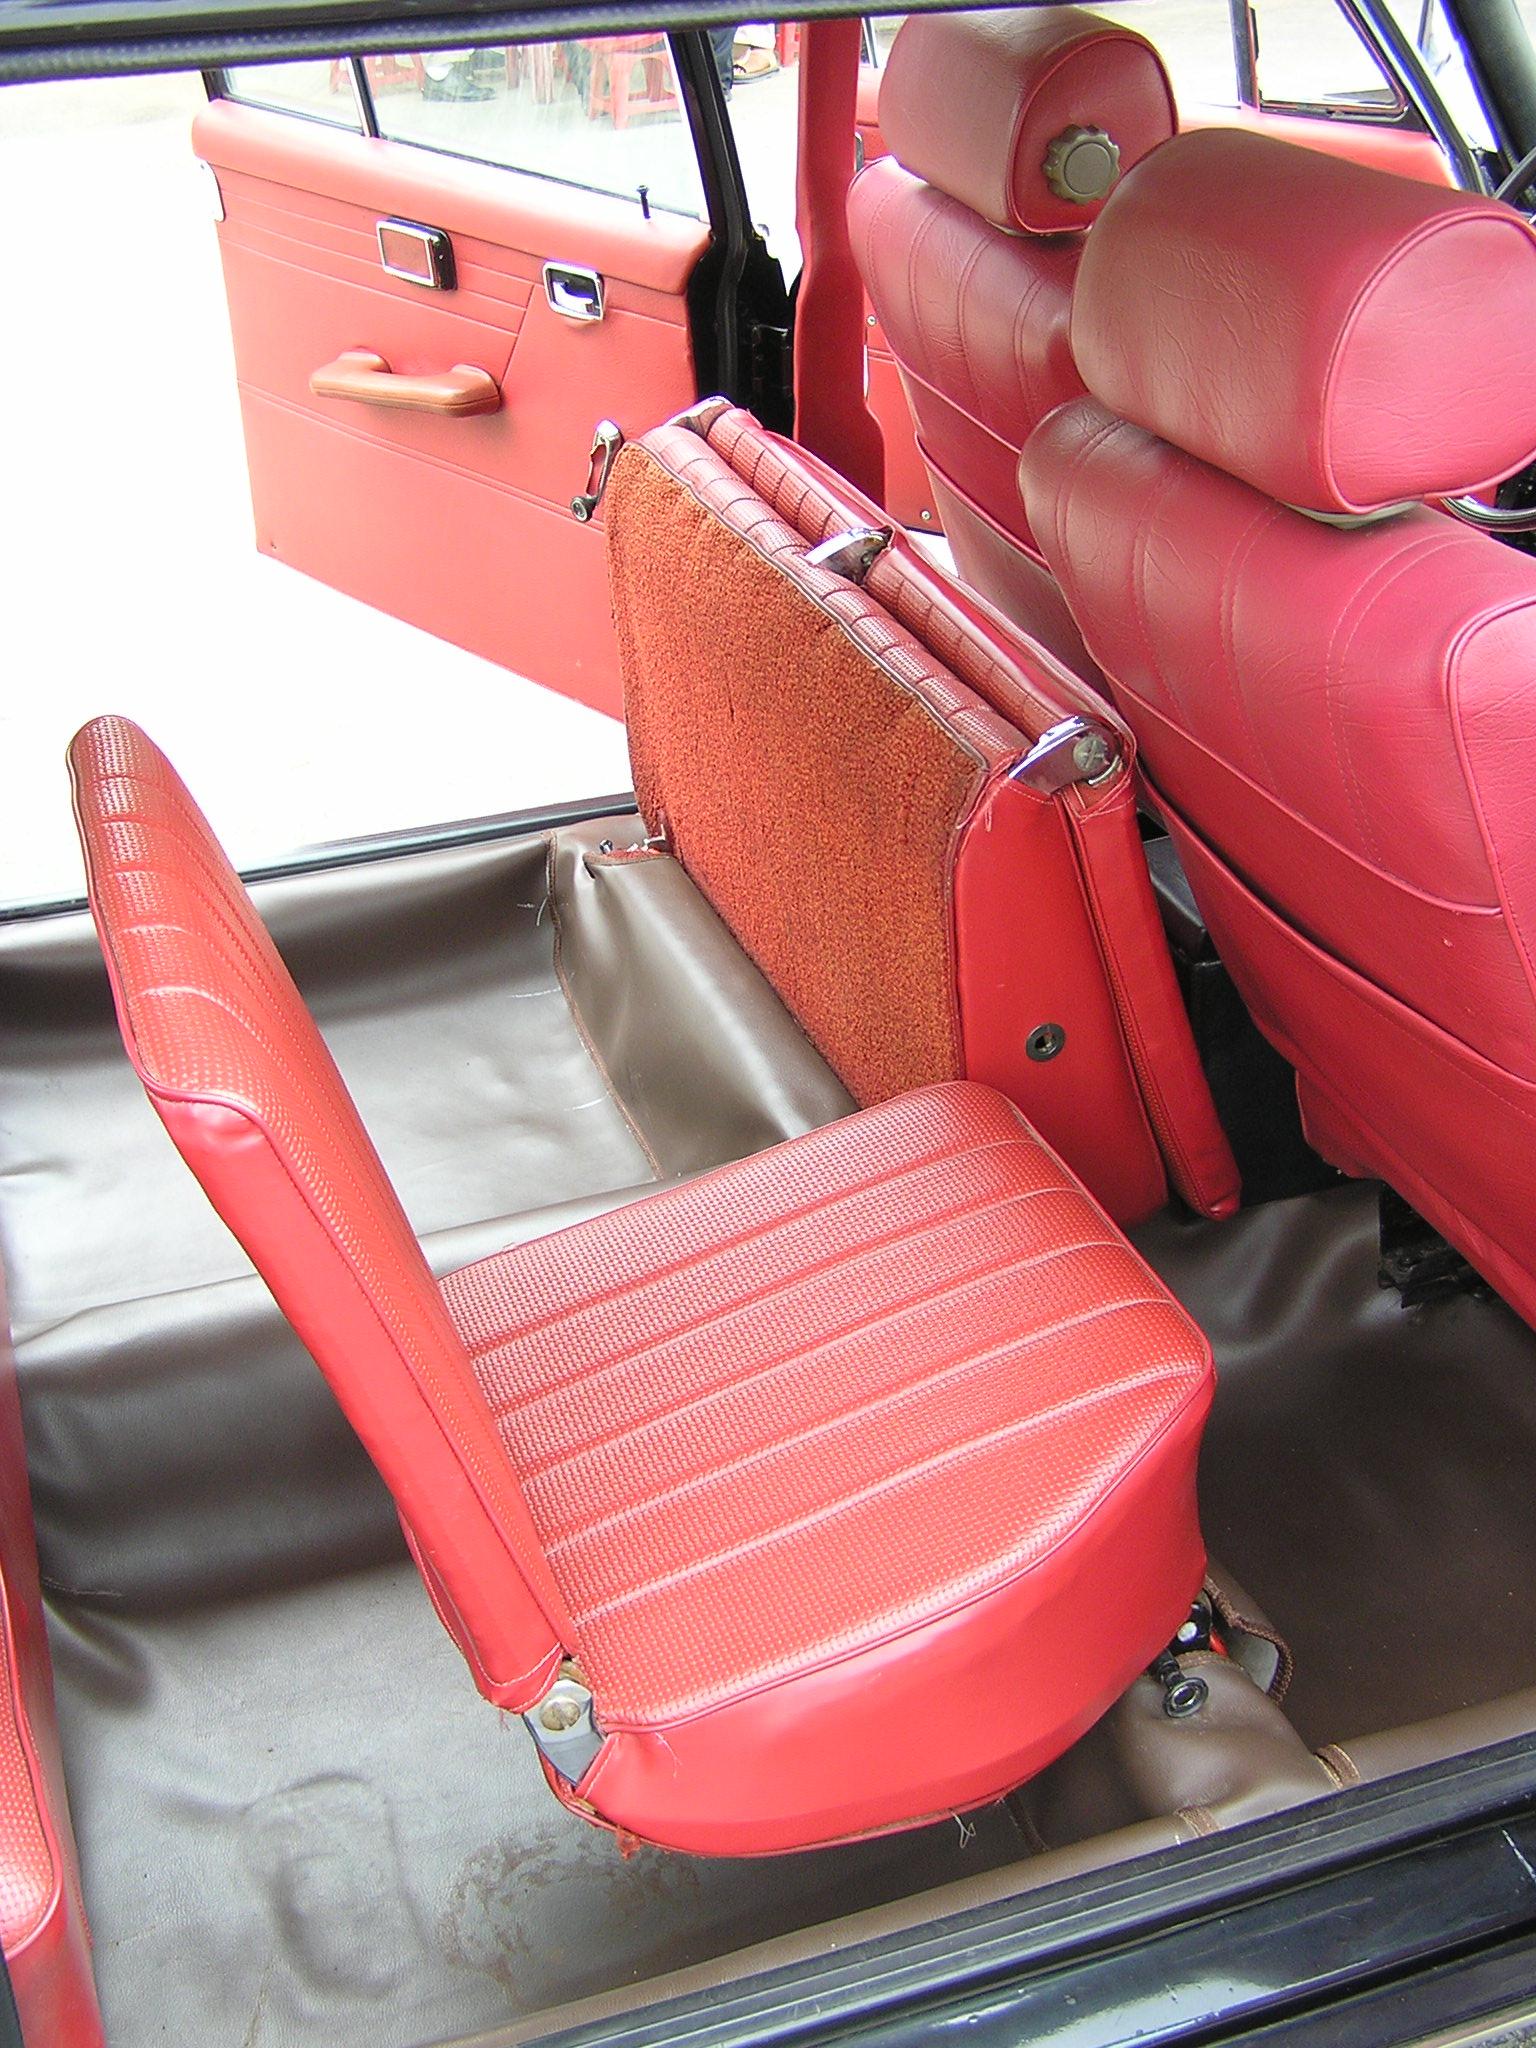 Trai-nghiem-qua-khu-ngot-ngao-tren-Mercedes-Benz-Limousine-230E-1969-anh-16